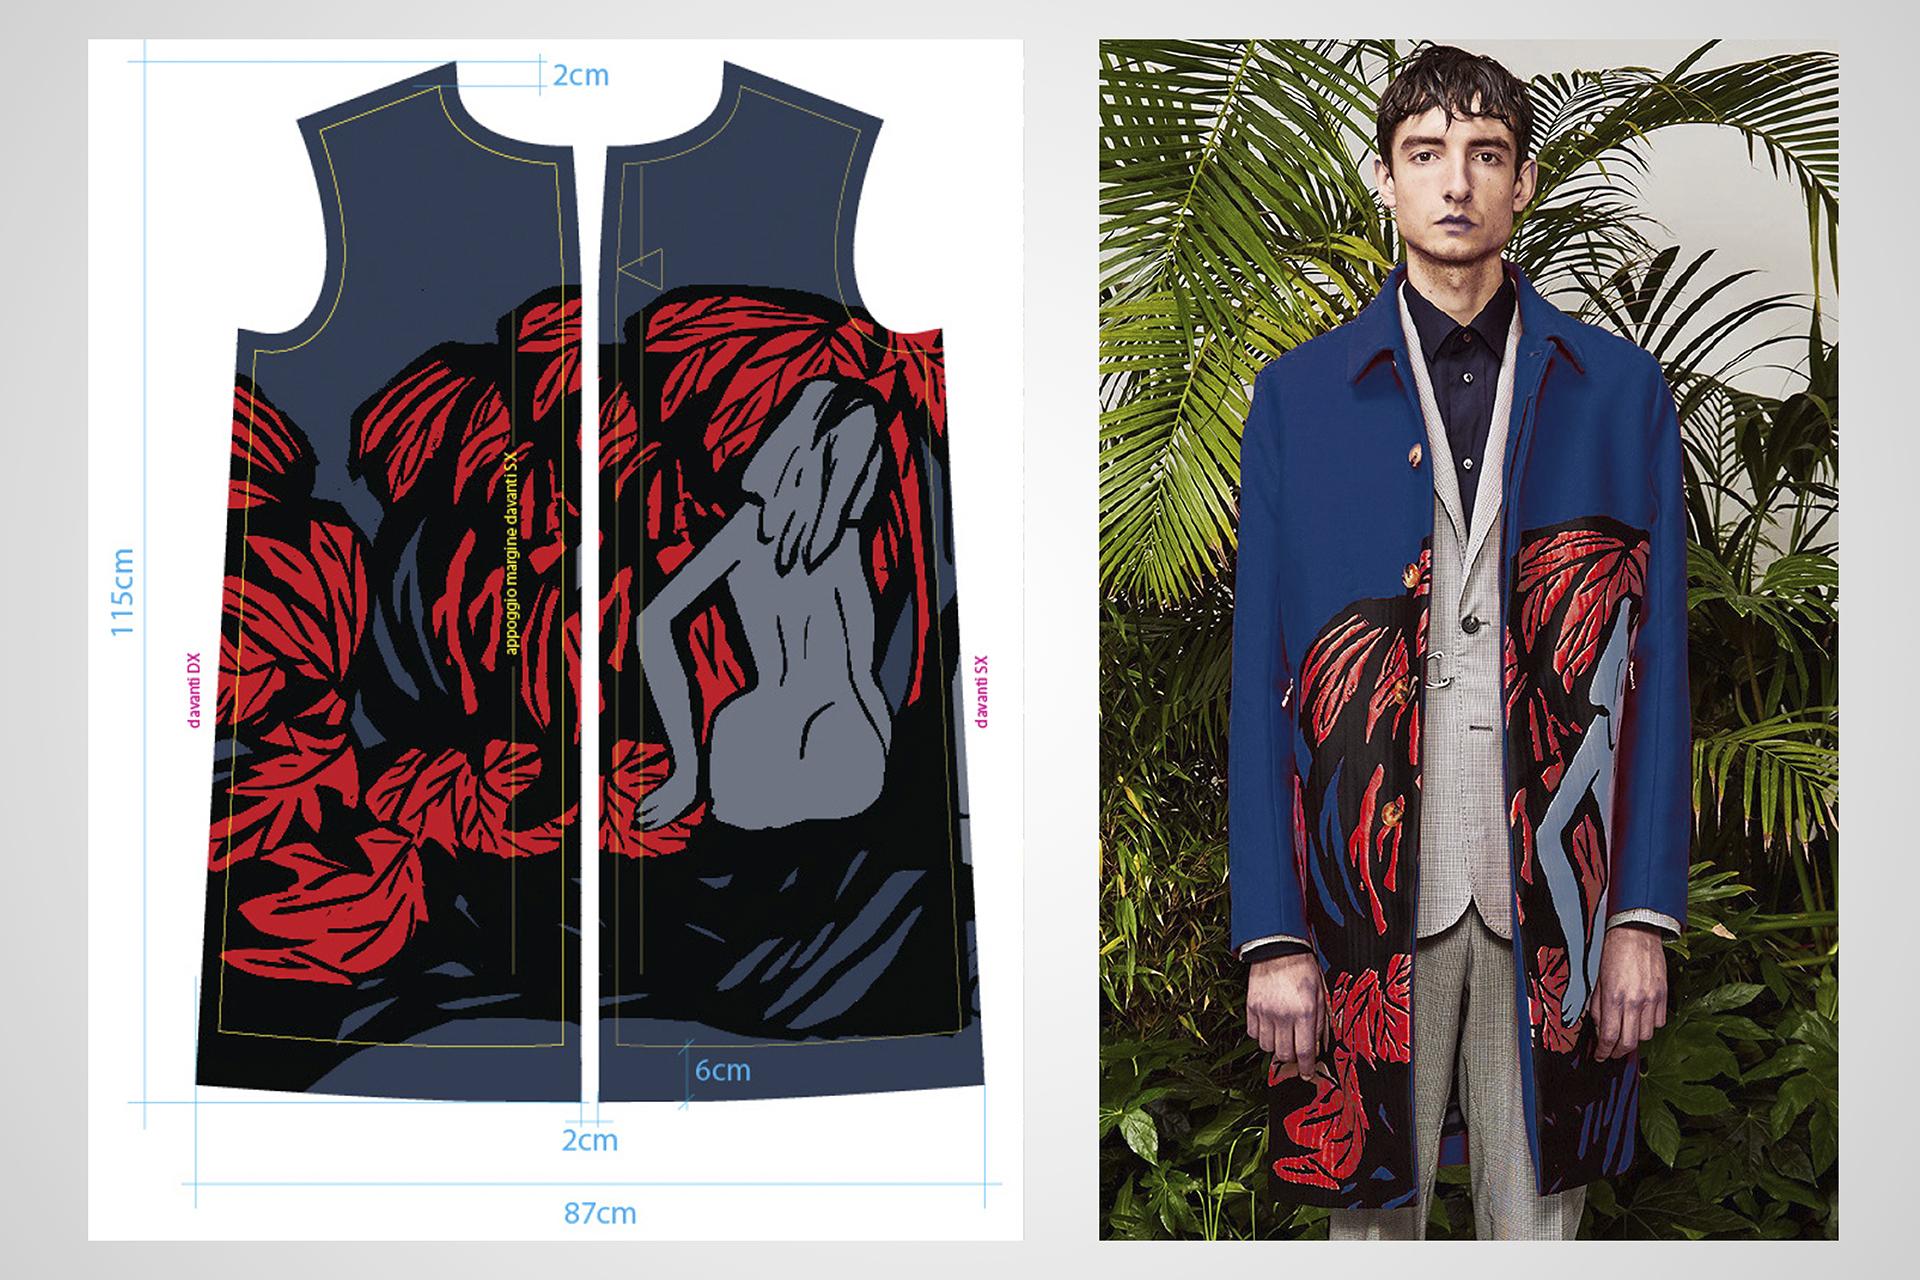 onafez design hostage vinci oamc pandemonium giacca palme rosse